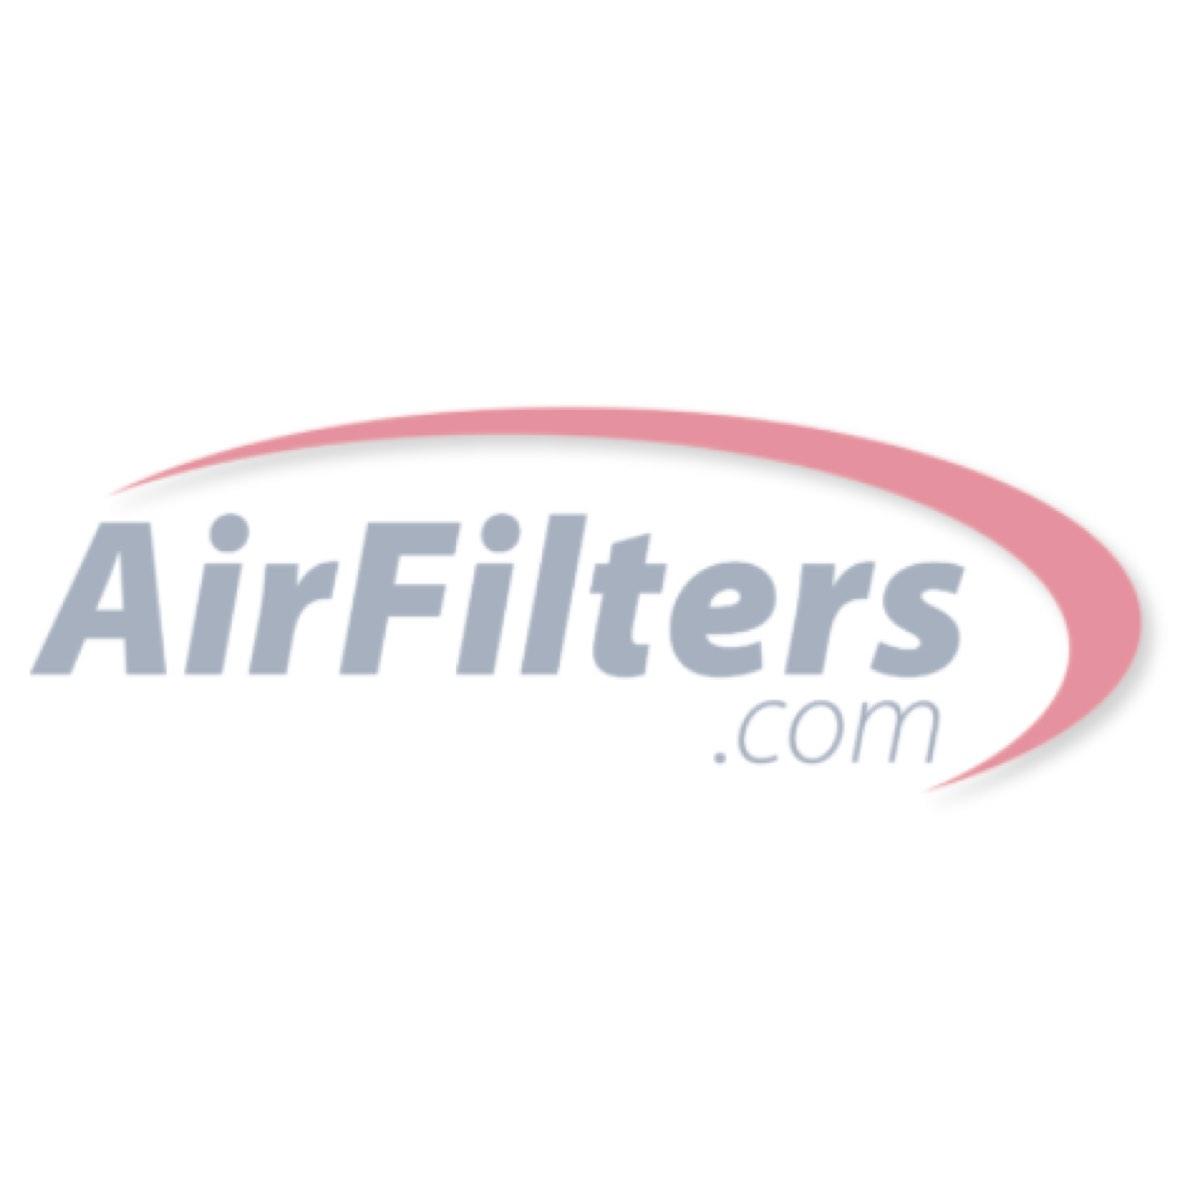 20x24.25x5 (19.75x24.25x4.75) Purolator Furnace Filters by Accumulair®